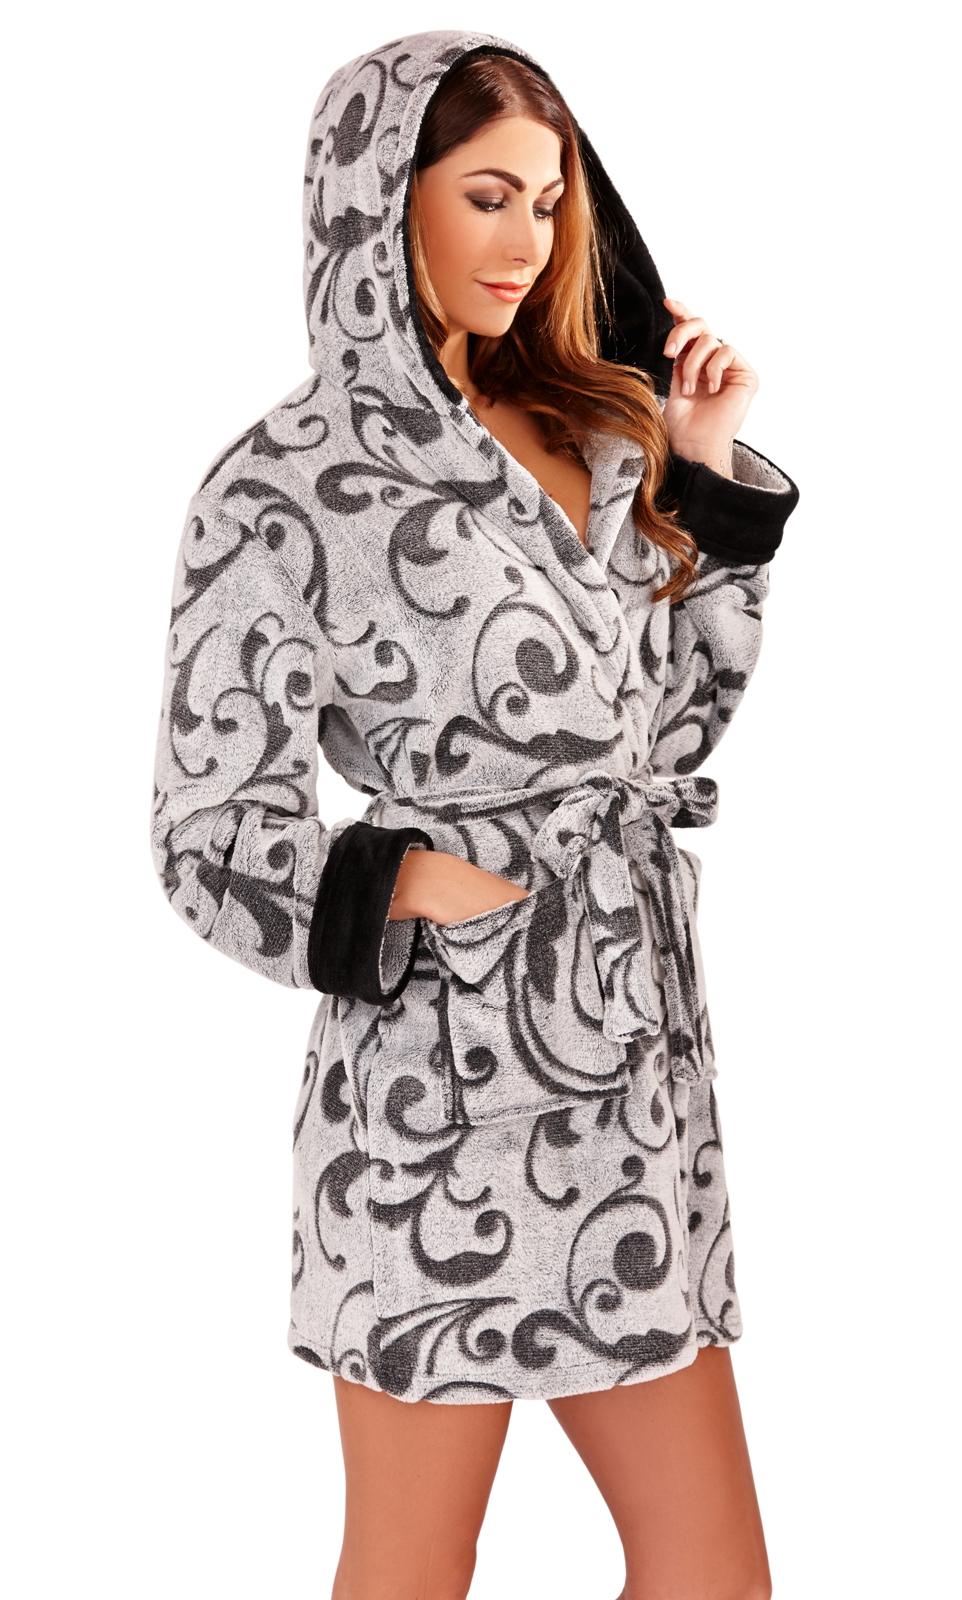 db03139d71 Womens Short Hooded Dressing Gown Bath Robe Housecoat + Belt Ladies ...